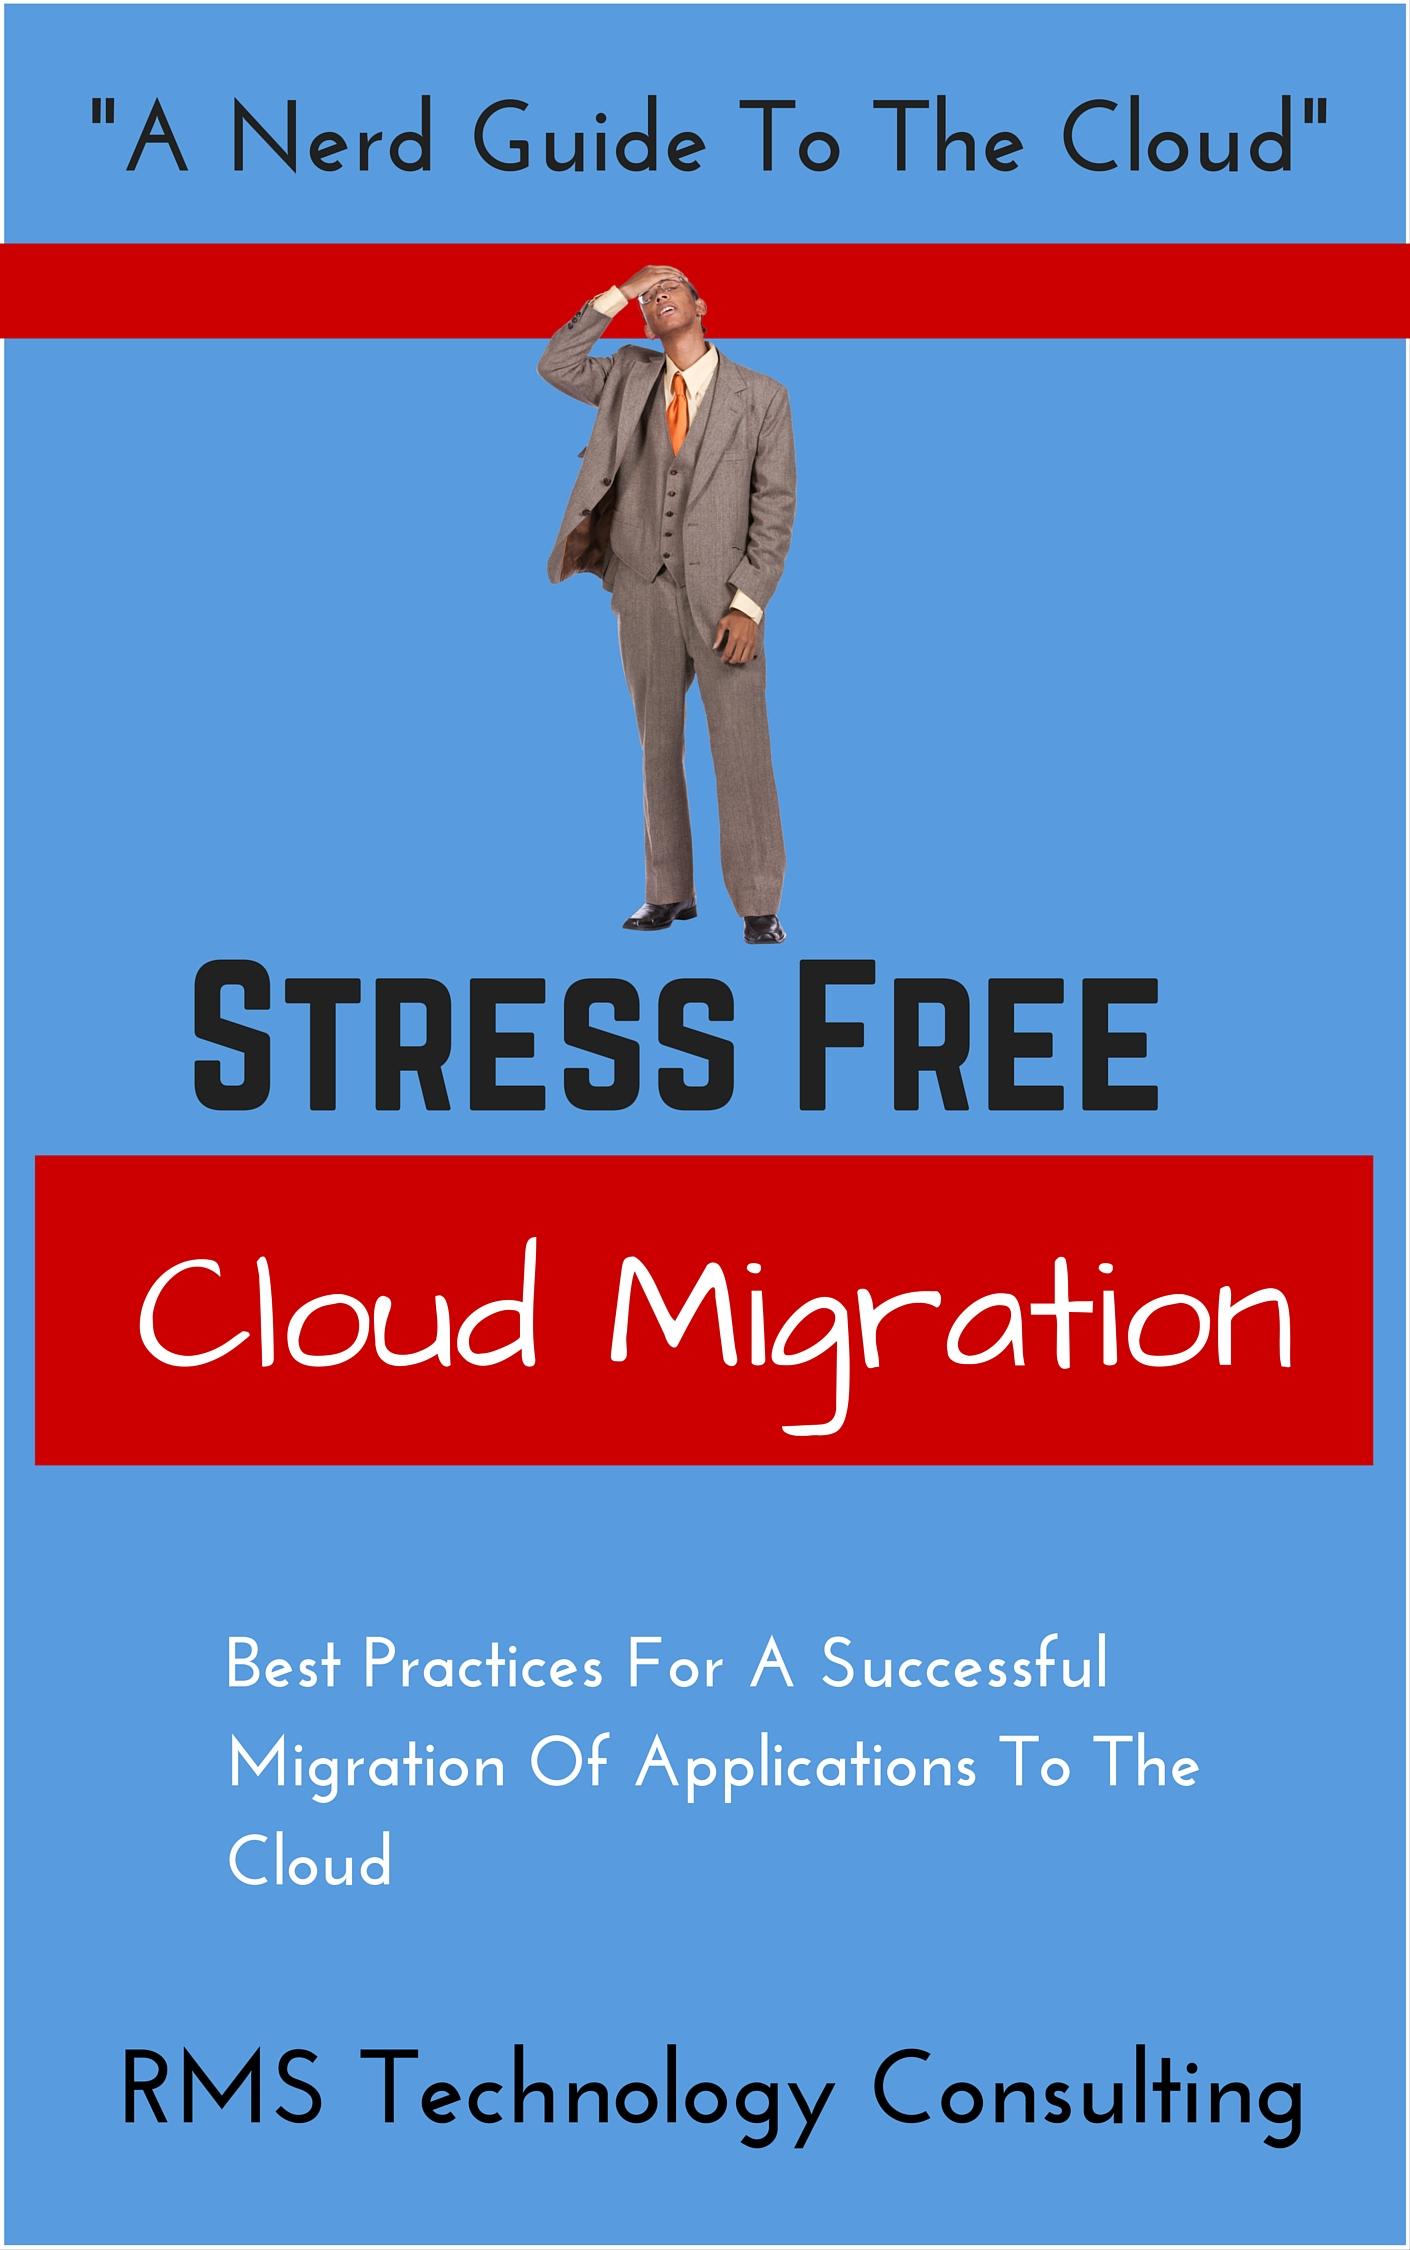 Stress Free Cloud Migration